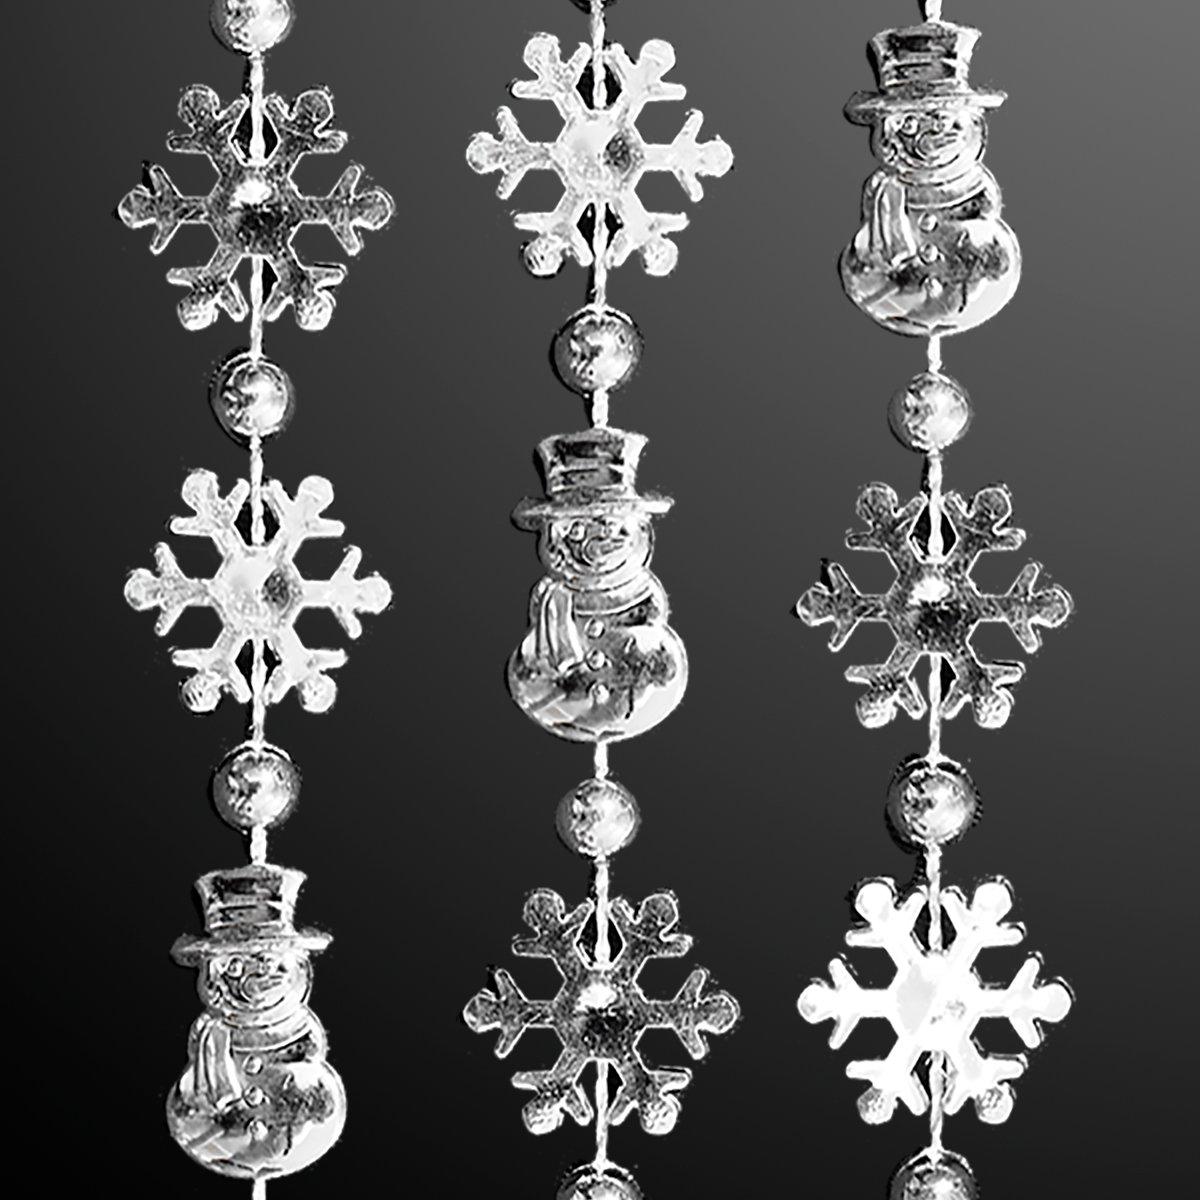 FlashingBlinkyLights Silver Snowflakes & Snowman Bead Necklaces (Set of 72)